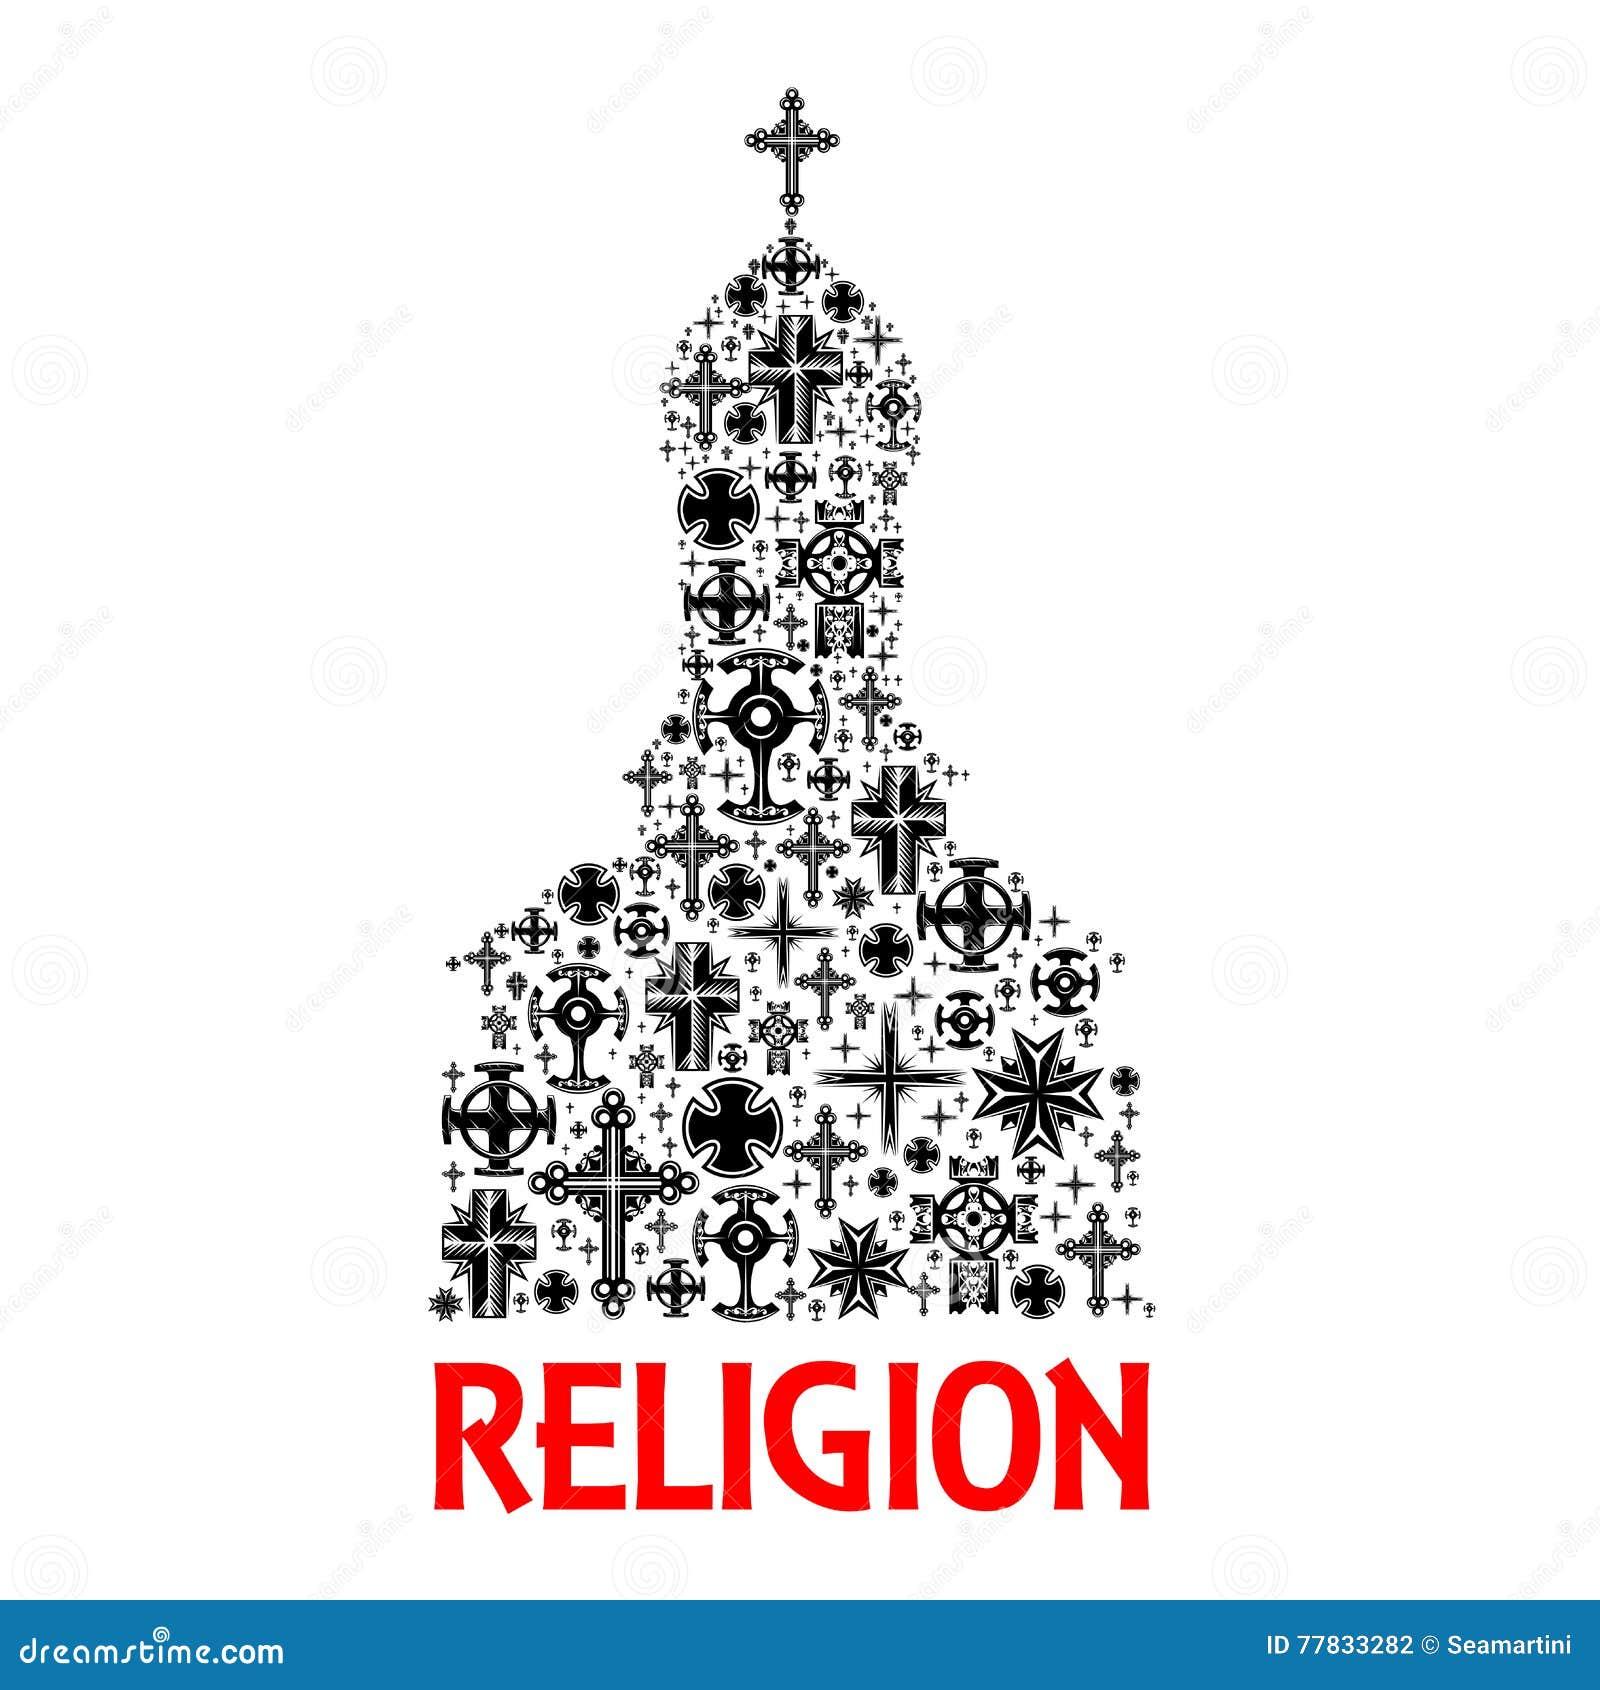 Church icon religion cross christianity symbols stock vector religion cross christianity symbols buycottarizona